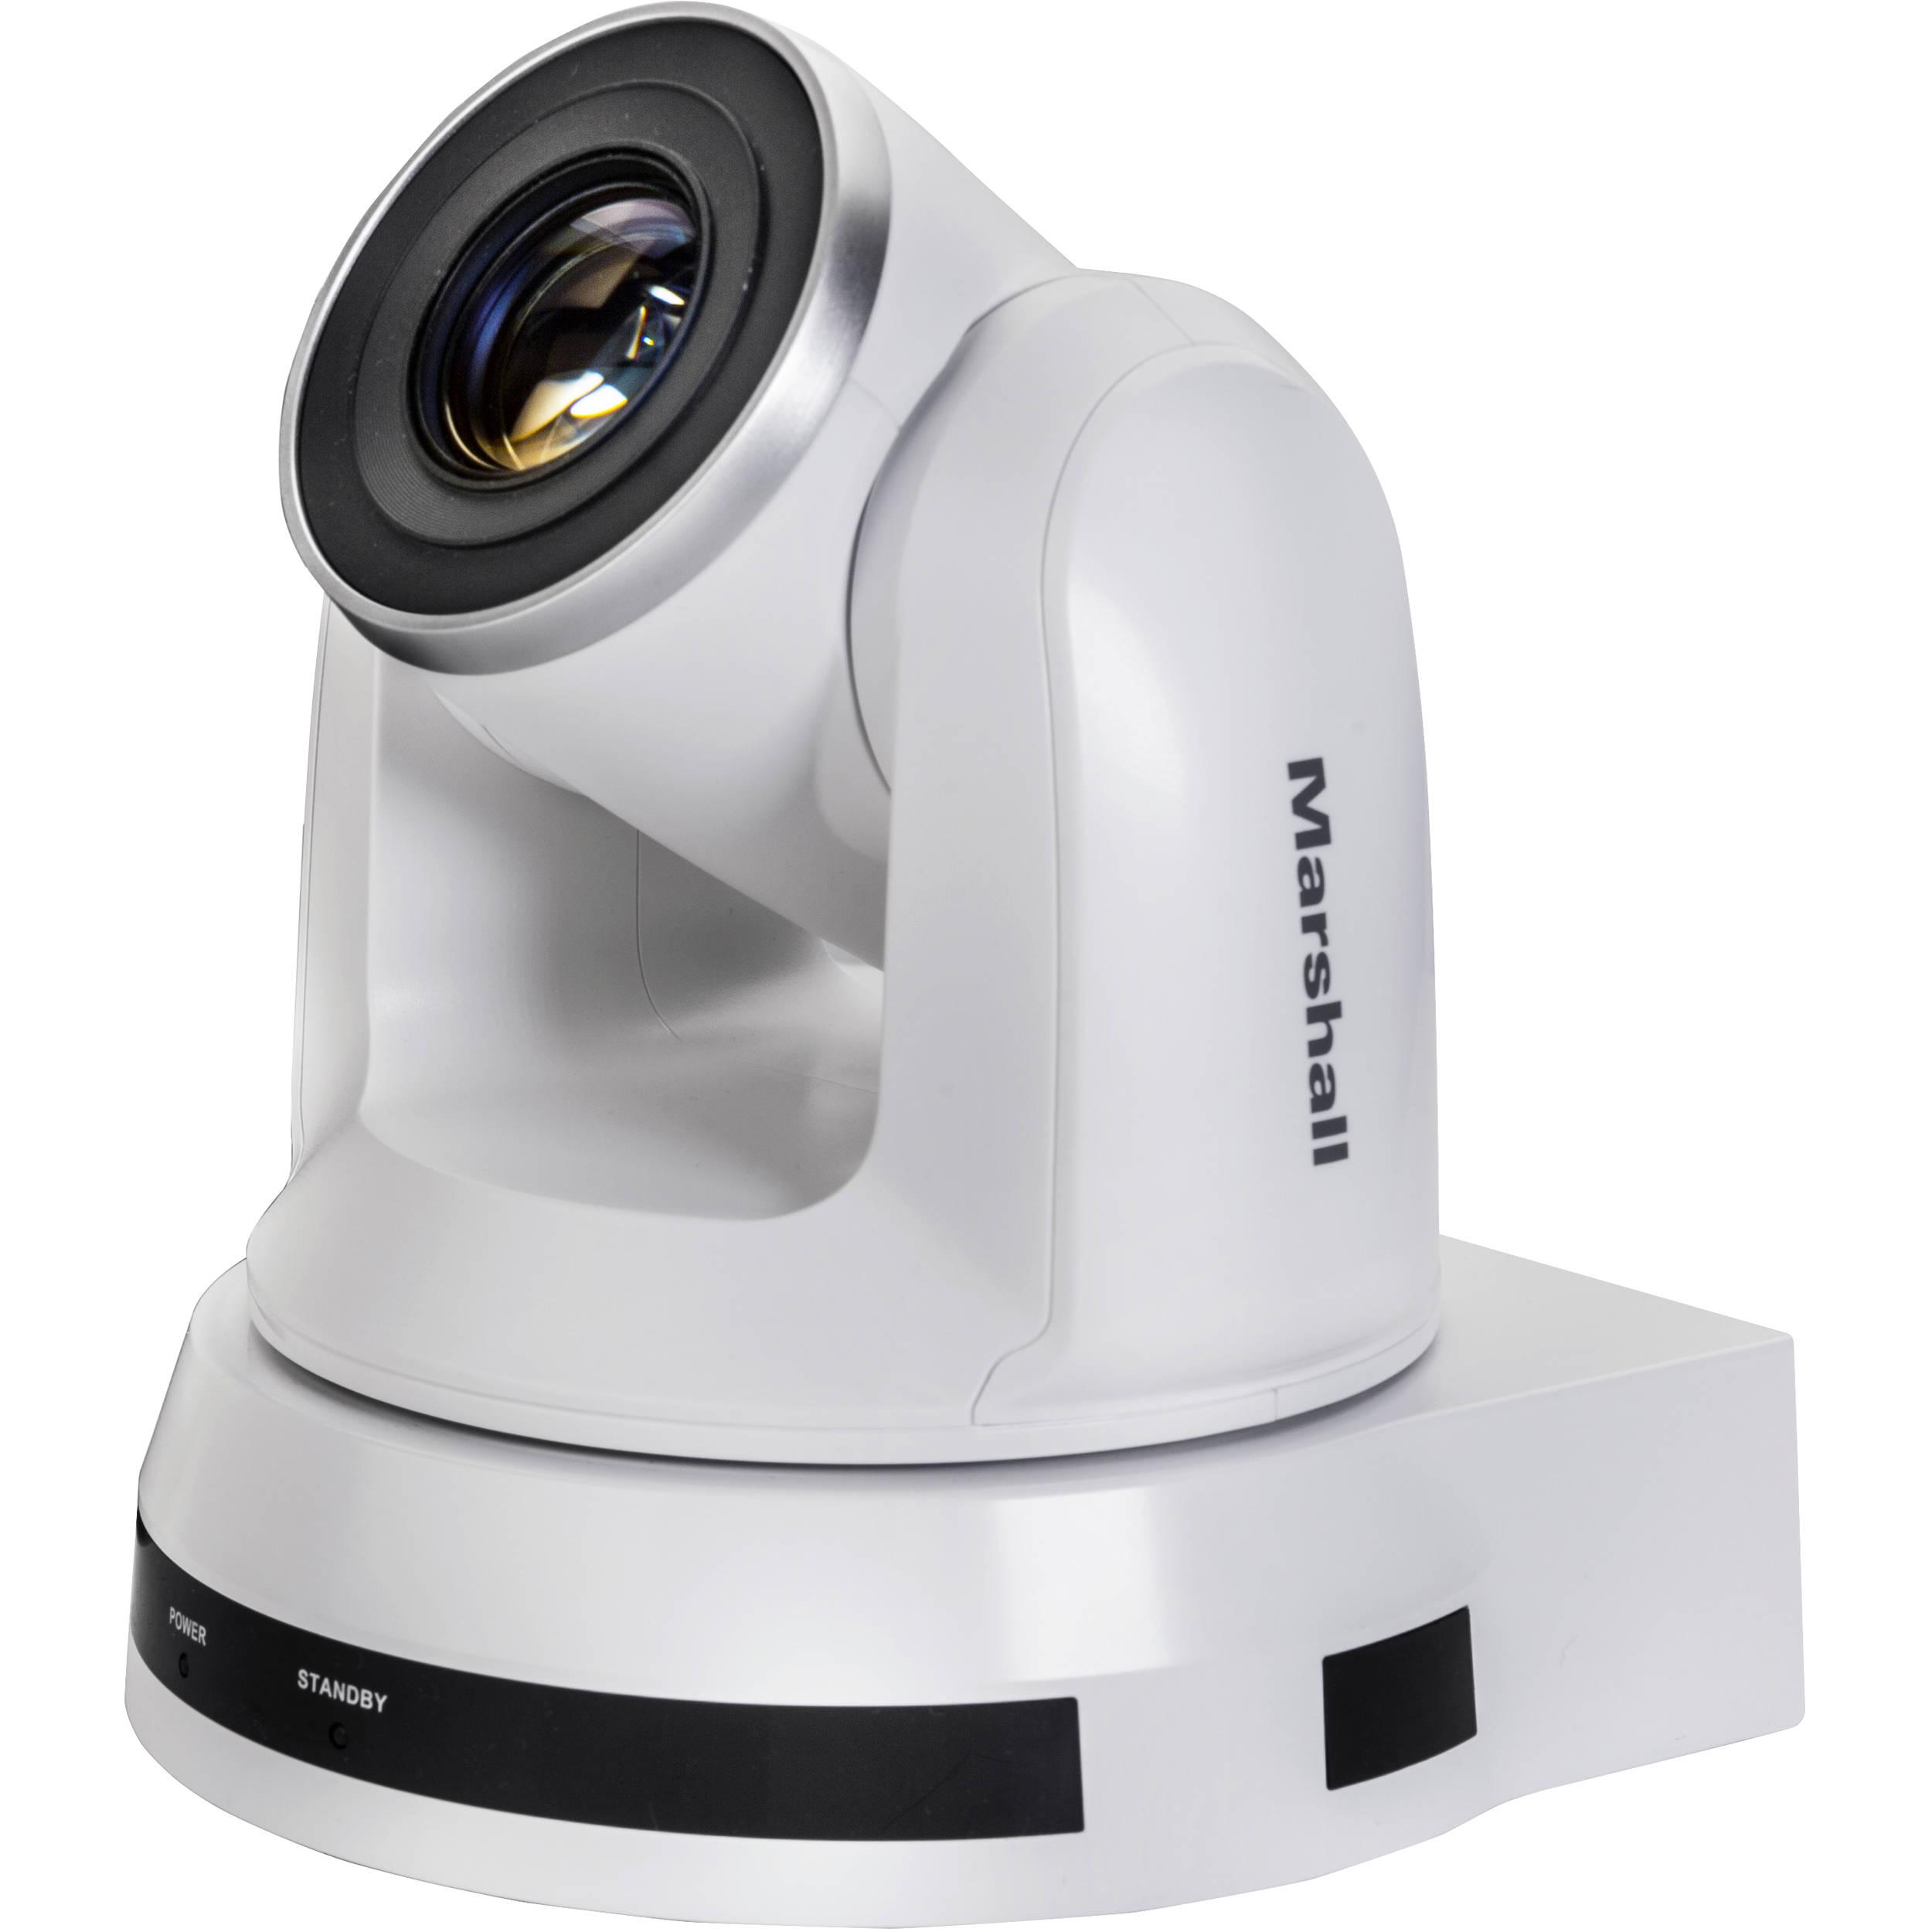 7432ce54b1a Marshall Electronics CV620-IP HD PTZ Camera (White) CV620-IPW